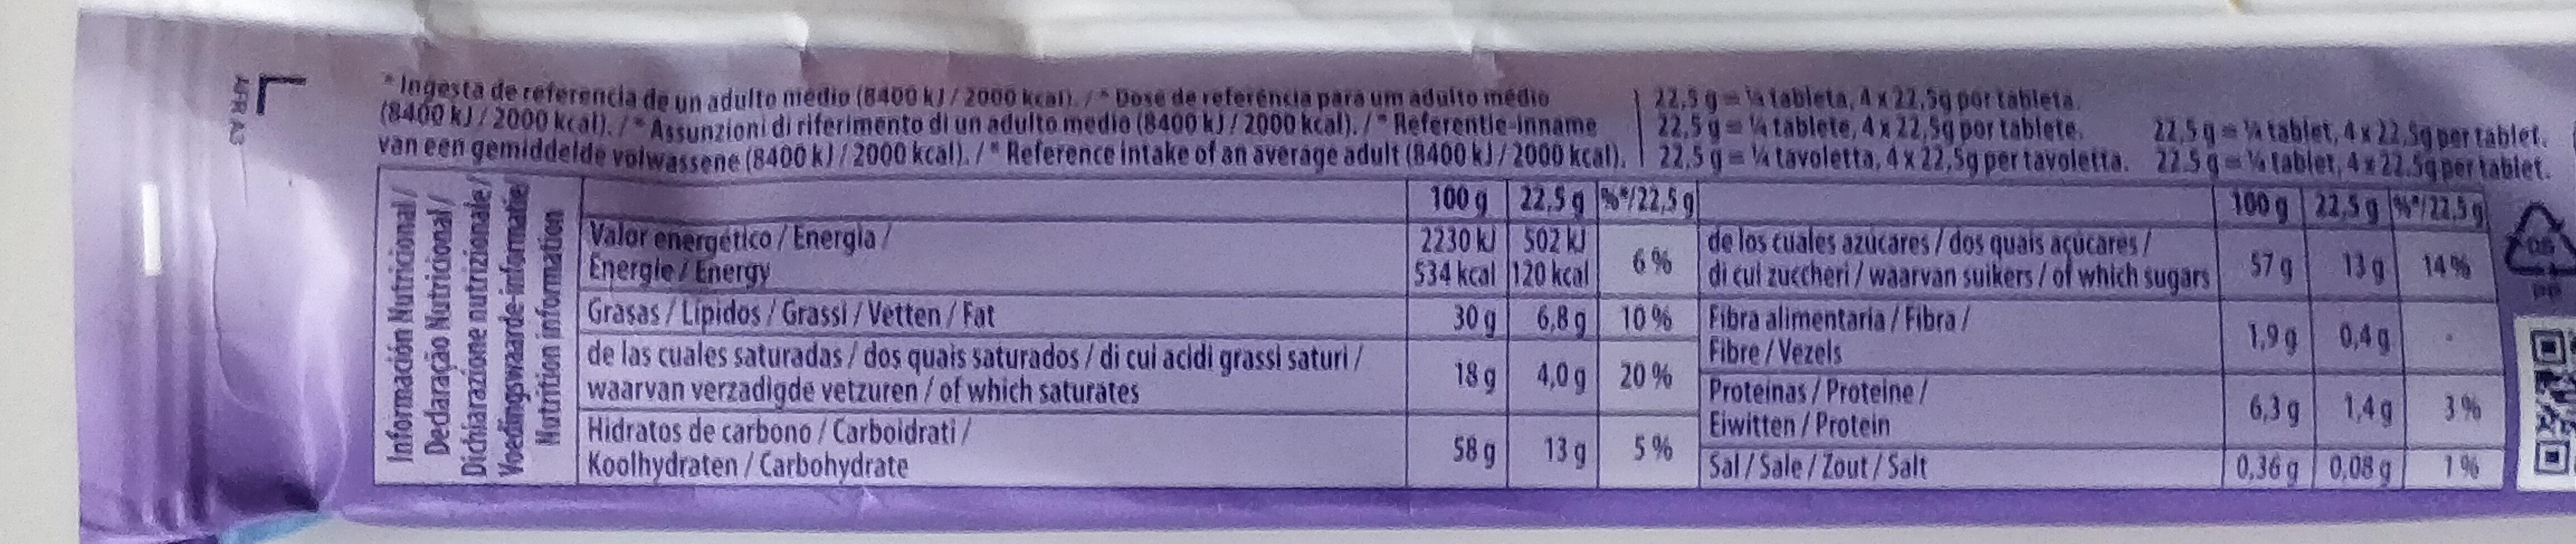 Milka Tavoletta Bubbly GR. 90 - Informació nutricional - es